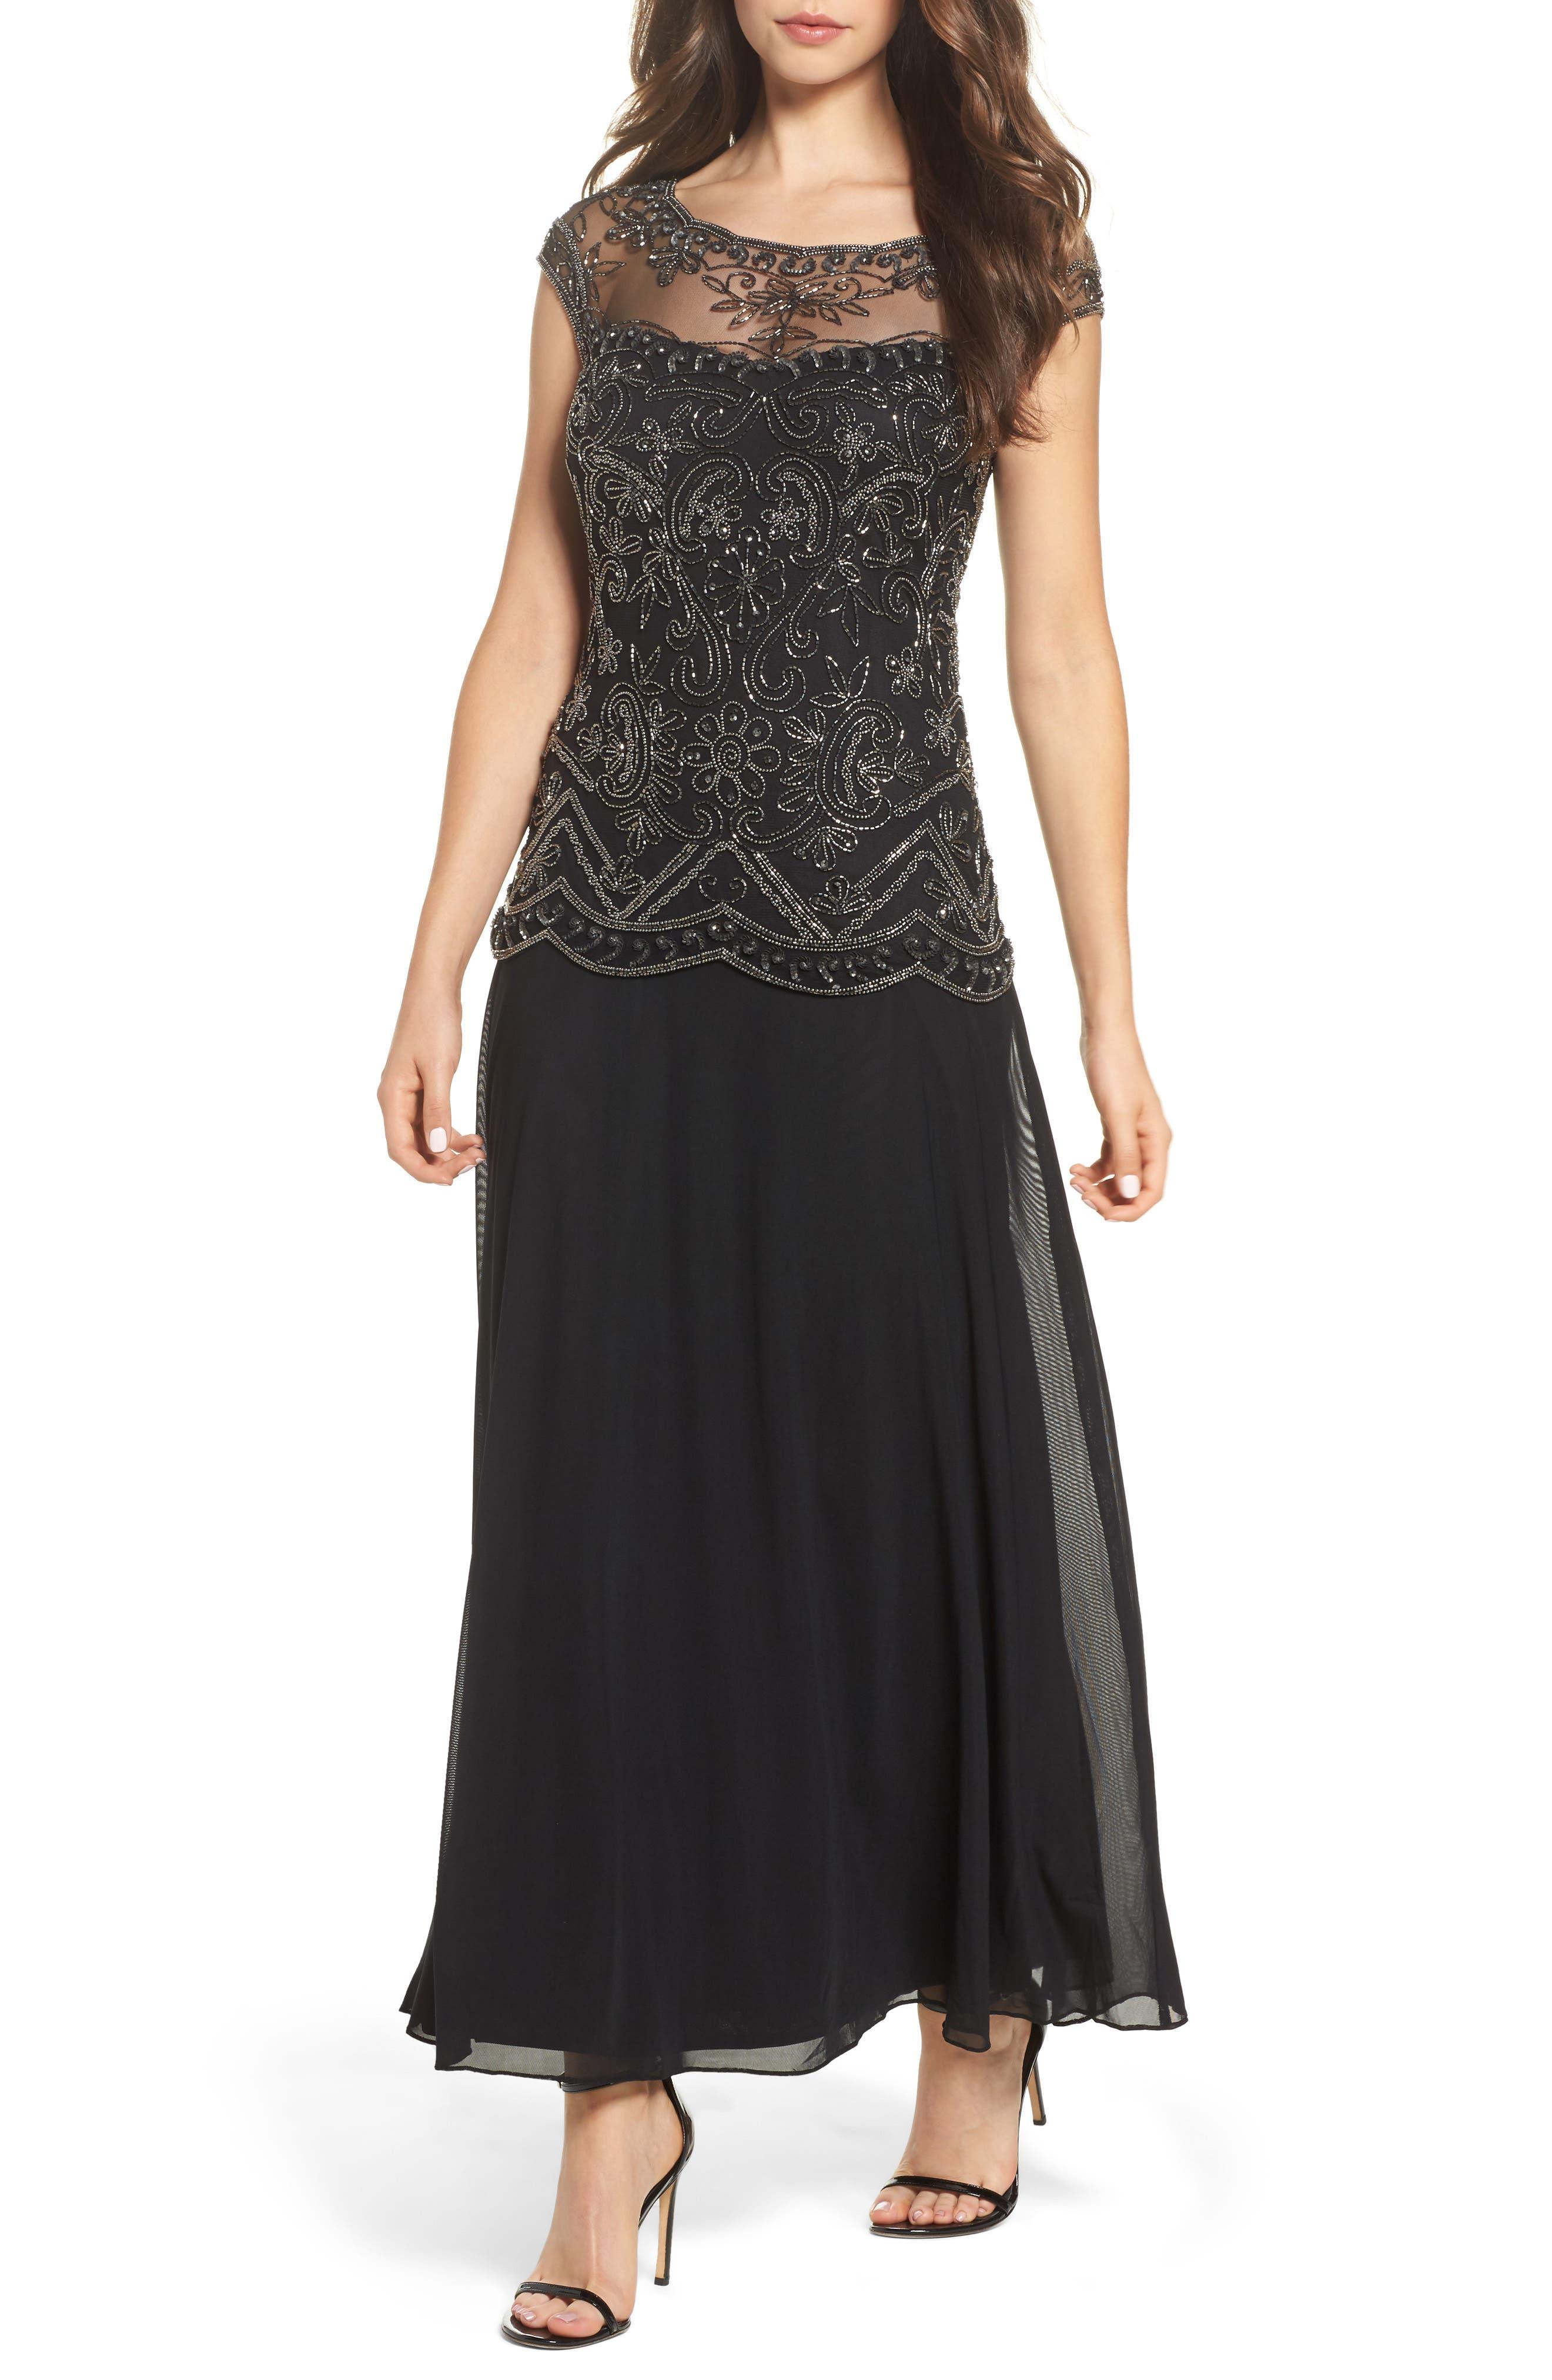 Embellished Cap Sleeve Long Dress,                             Main thumbnail 1, color,                             Black